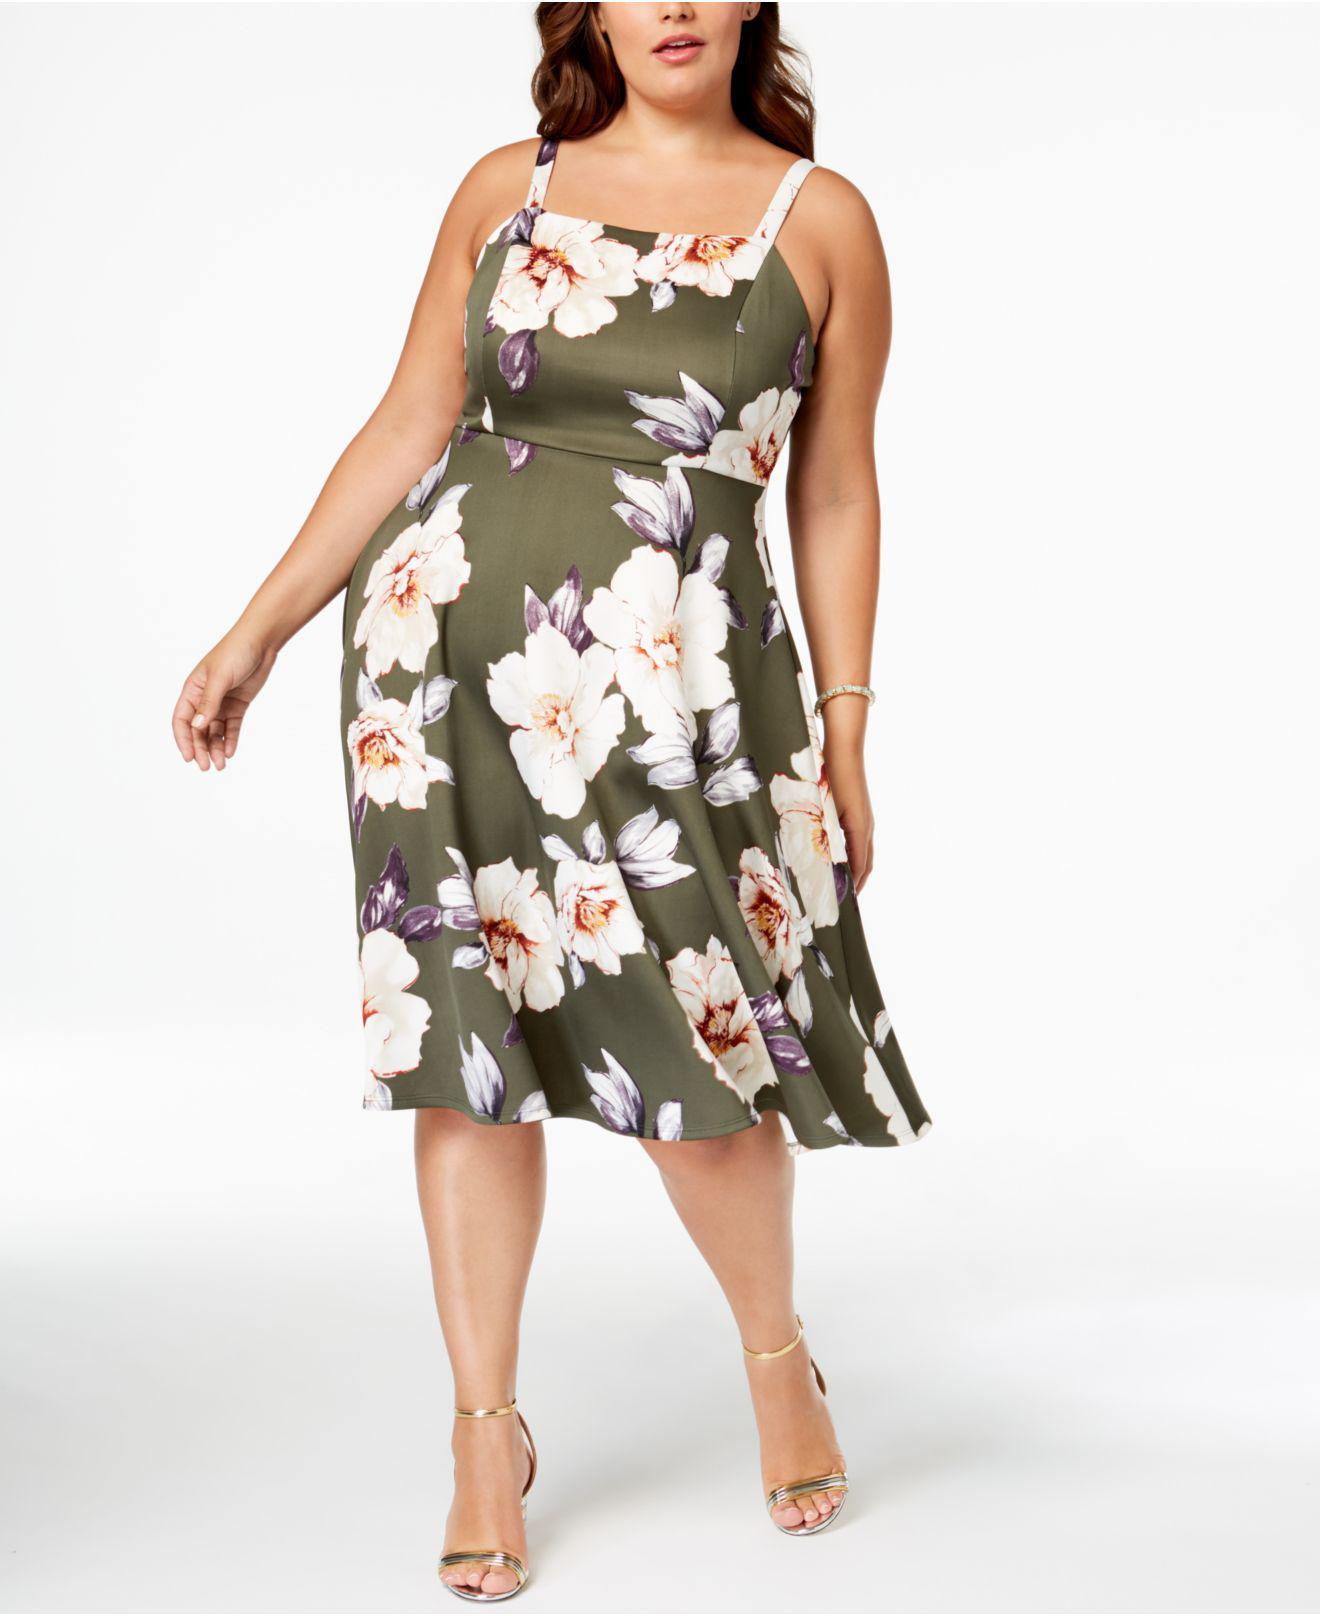 7c03157eab6 Lyst - Soprano Trendy Plus Size Floral-print Midi Dress in Green